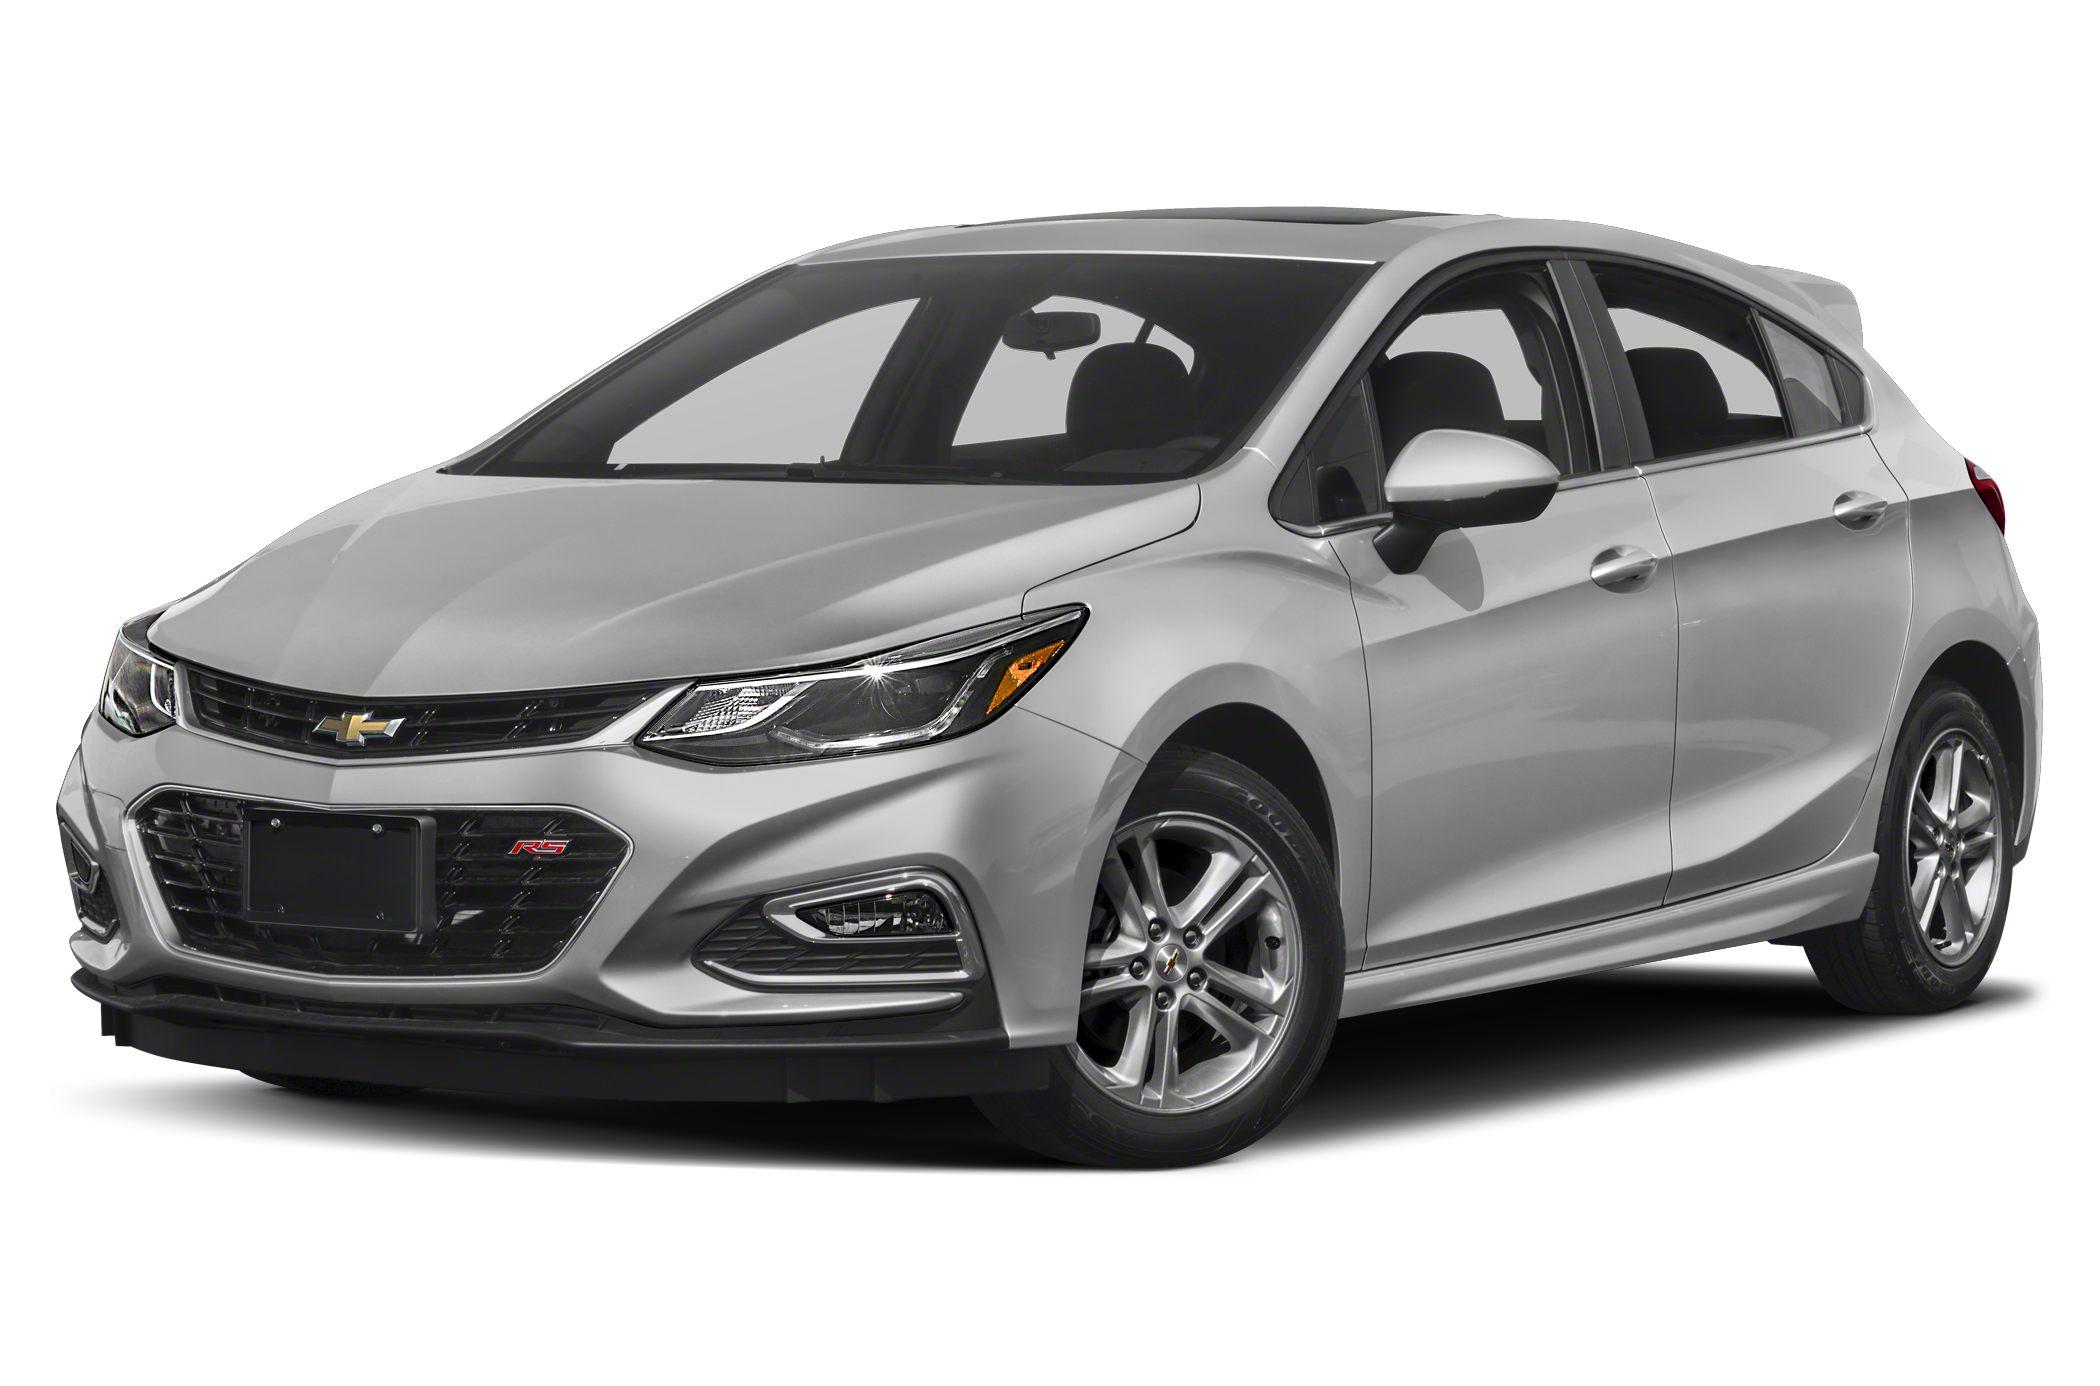 2018 Chevrolet Cruze Lt Auto 4dr Hatchback Specs And Prices